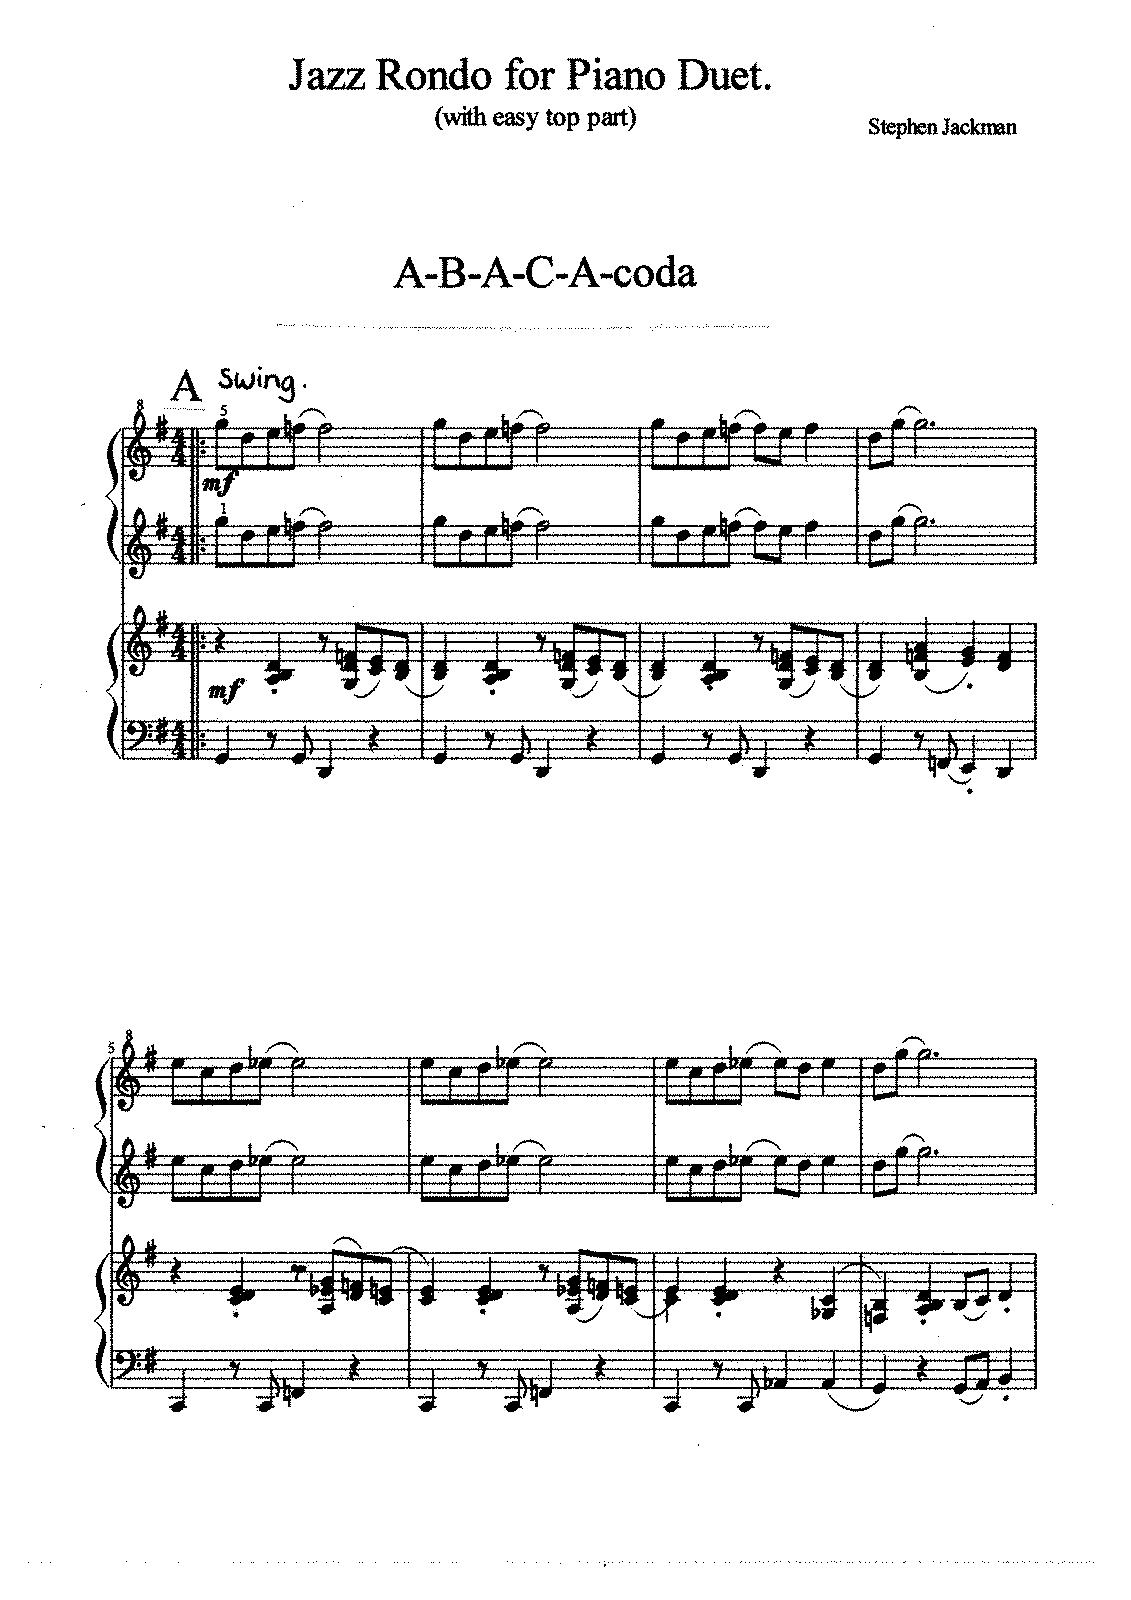 Jazz Rondos (Jackman, Stephen) - IMSLP/Petrucci Music